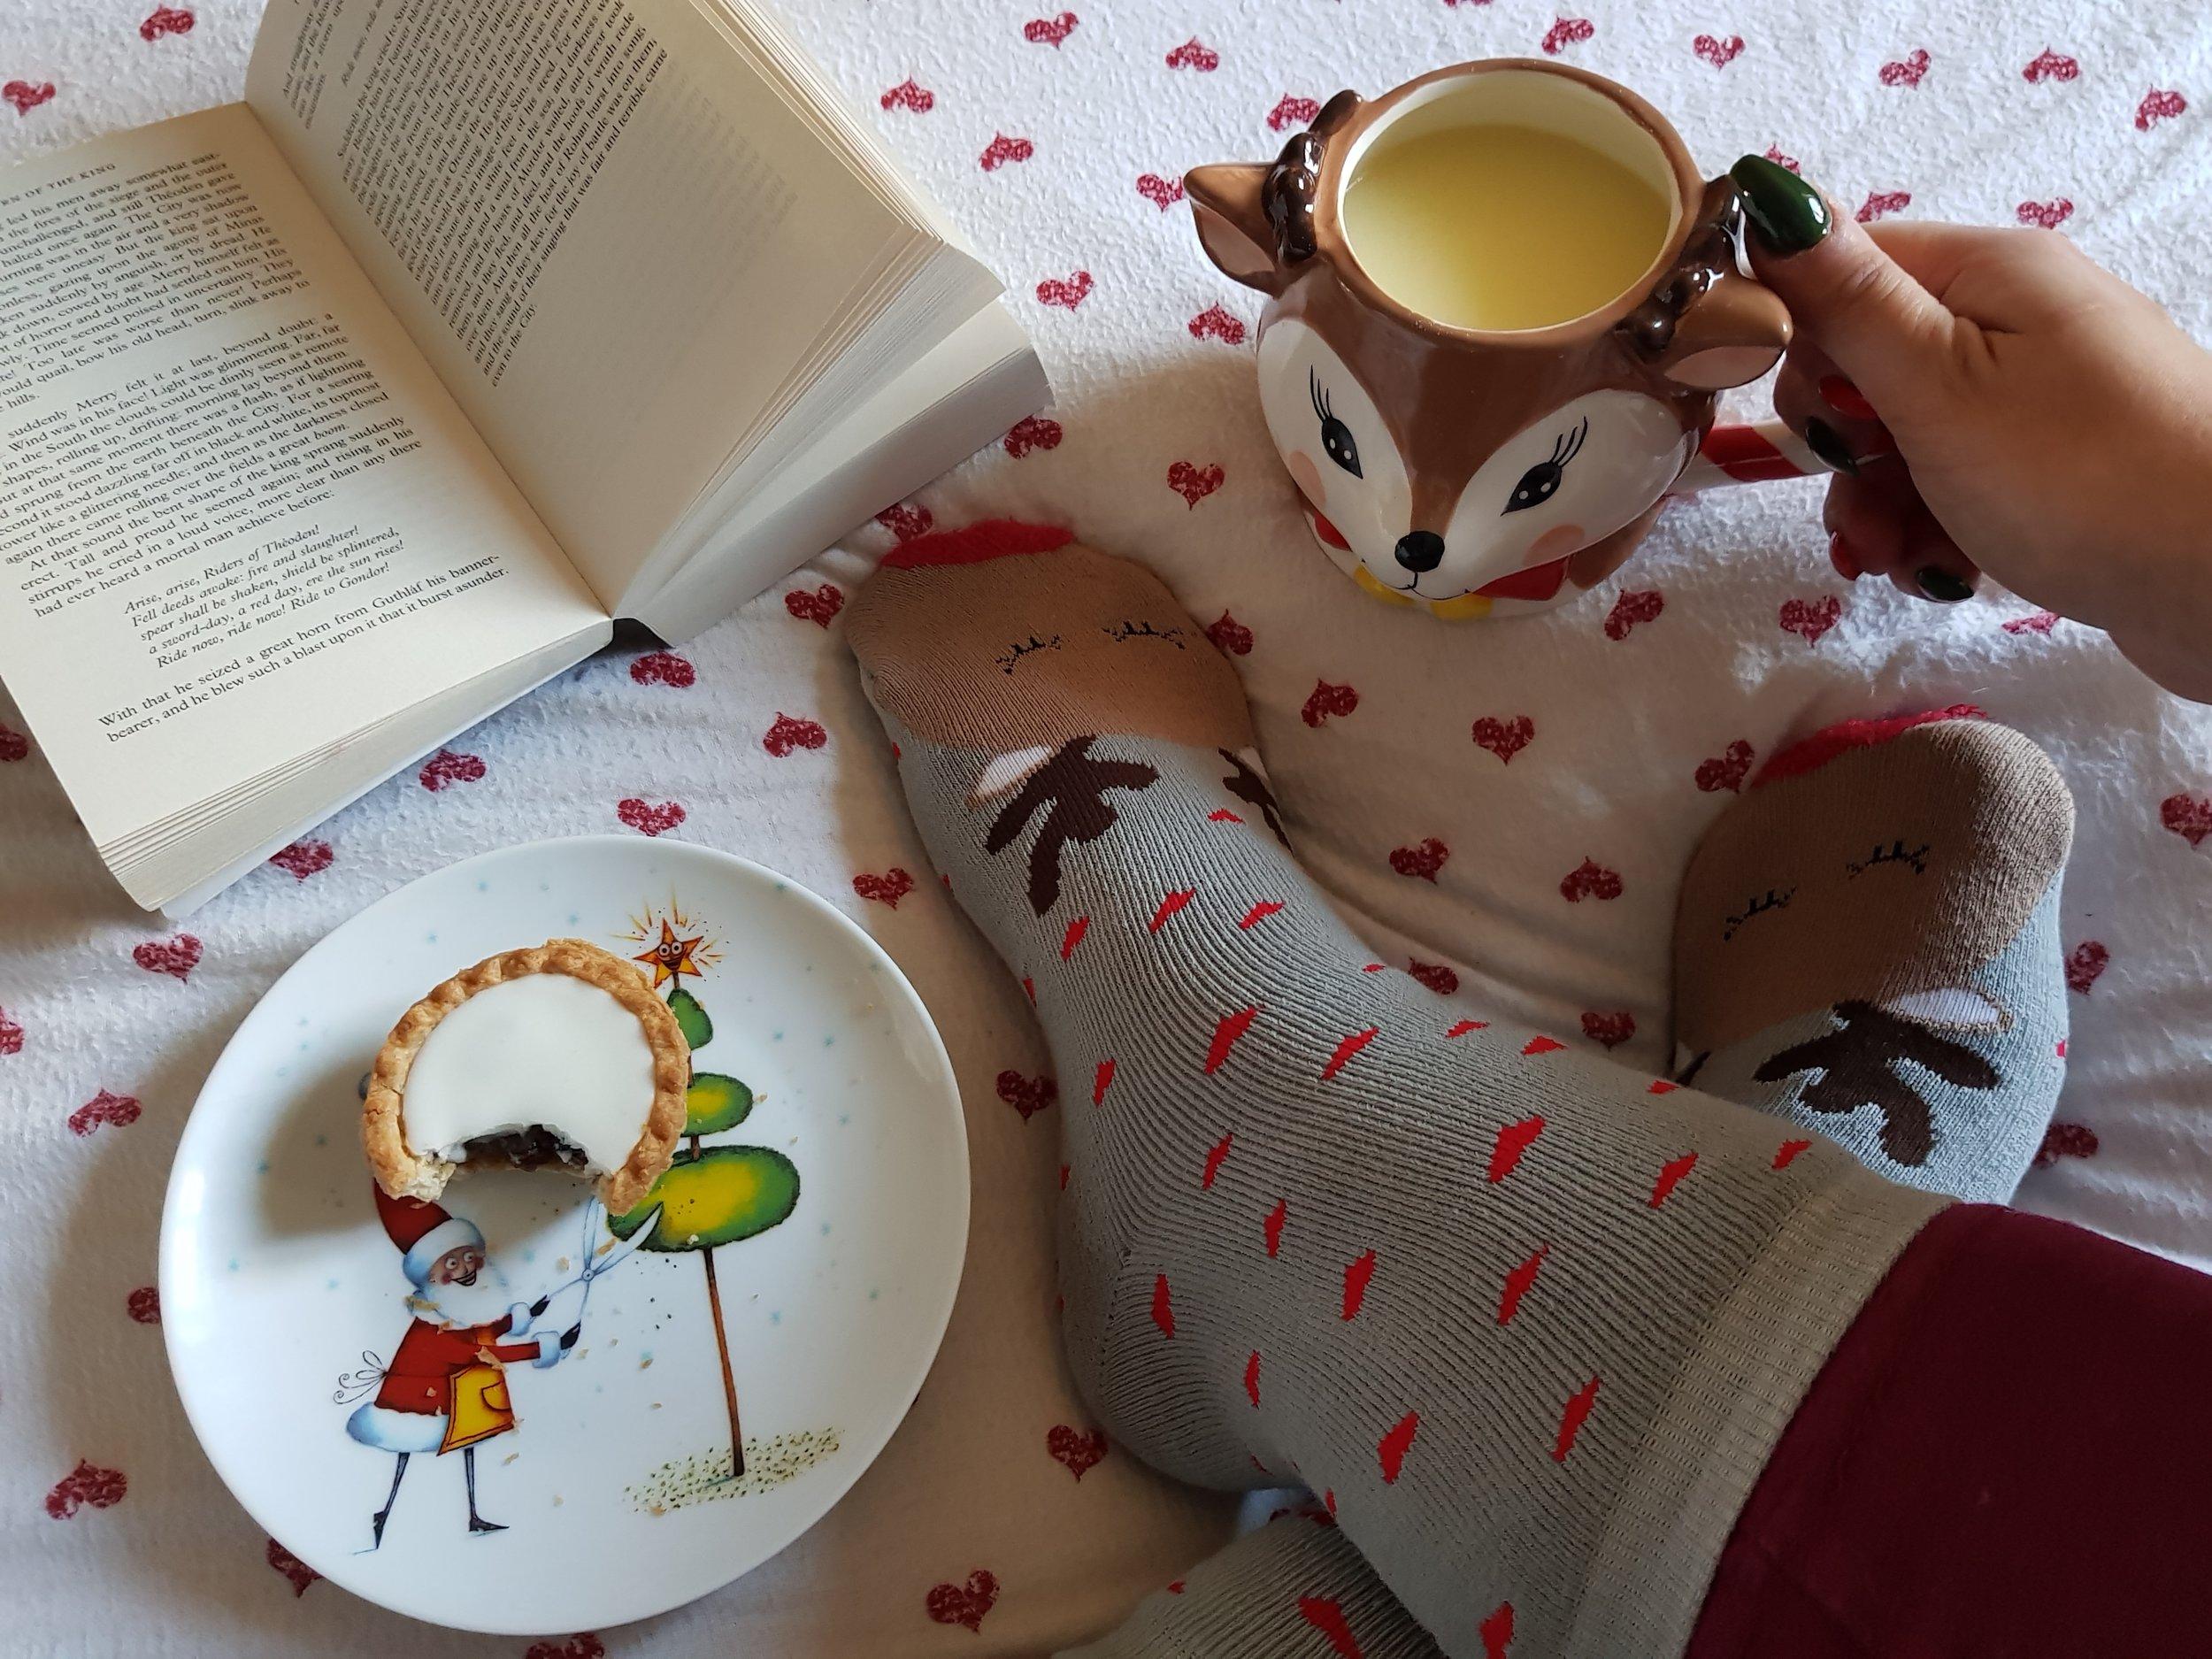 Mince pie, book, hot chocolate and Christmas socks